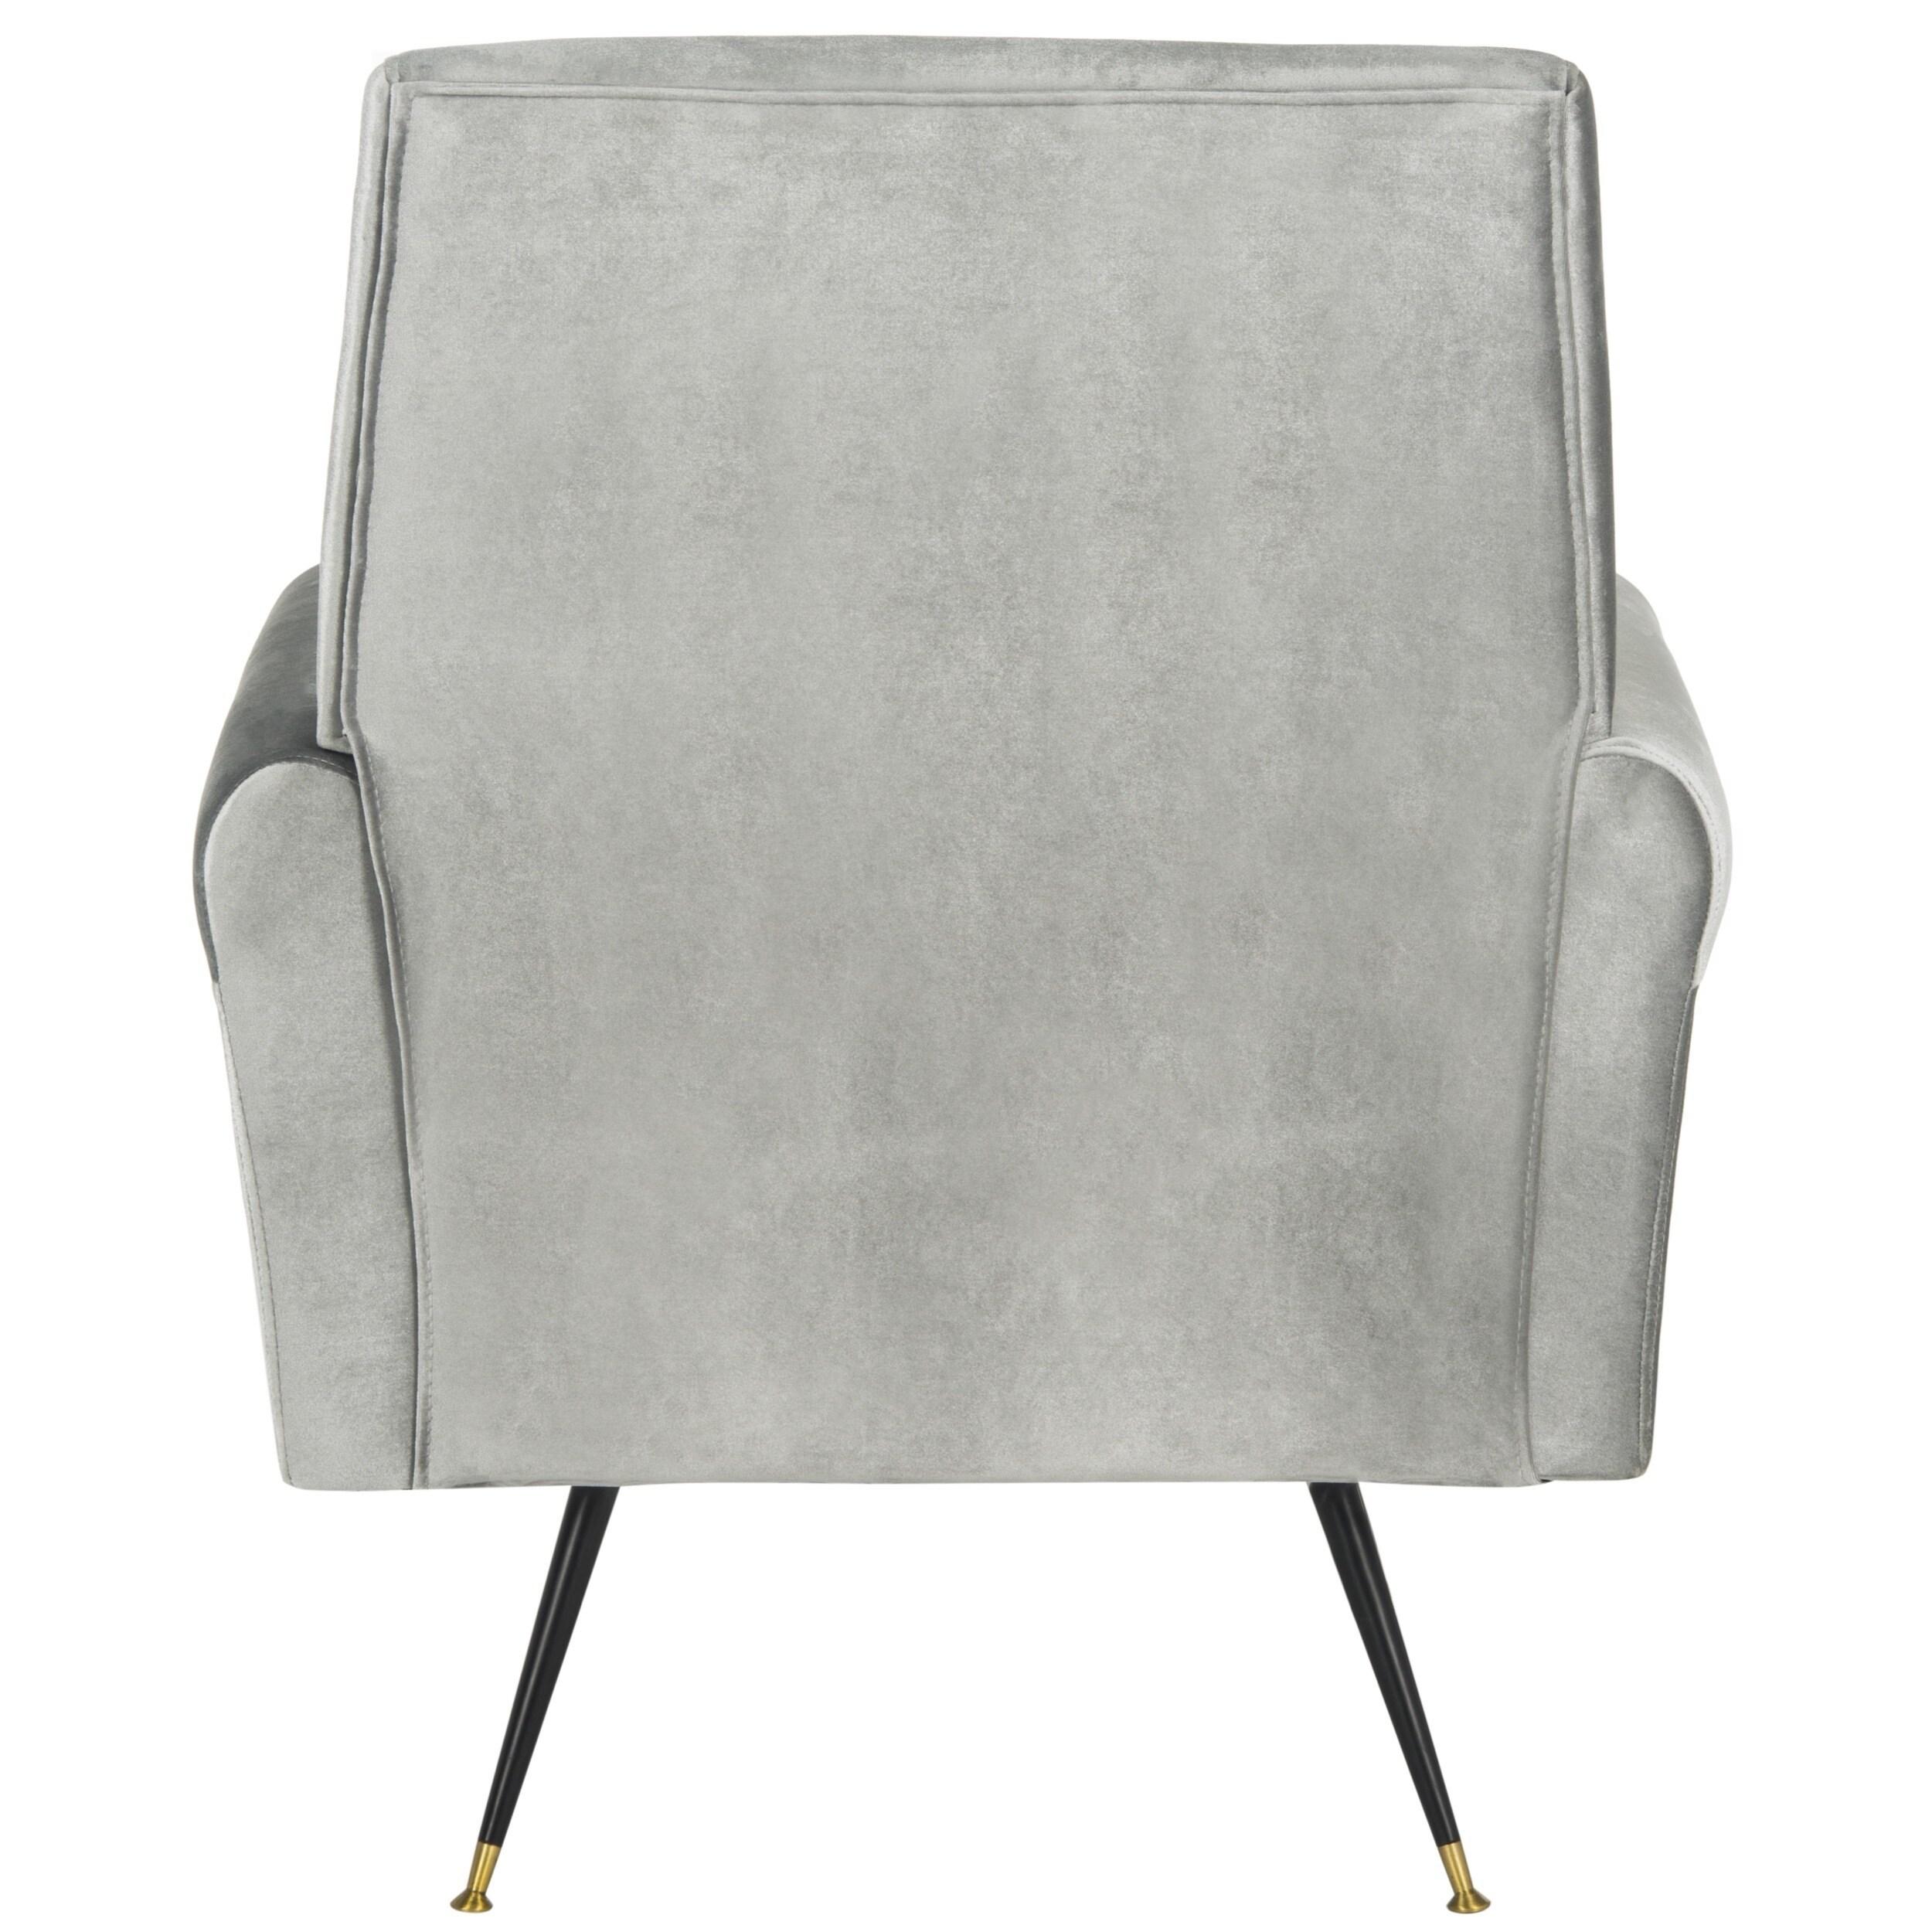 Safavieh Mid Century Modern Glam Mira Velvet Light Grey Club Chair   Free  Shipping Today   Overstock   20044607